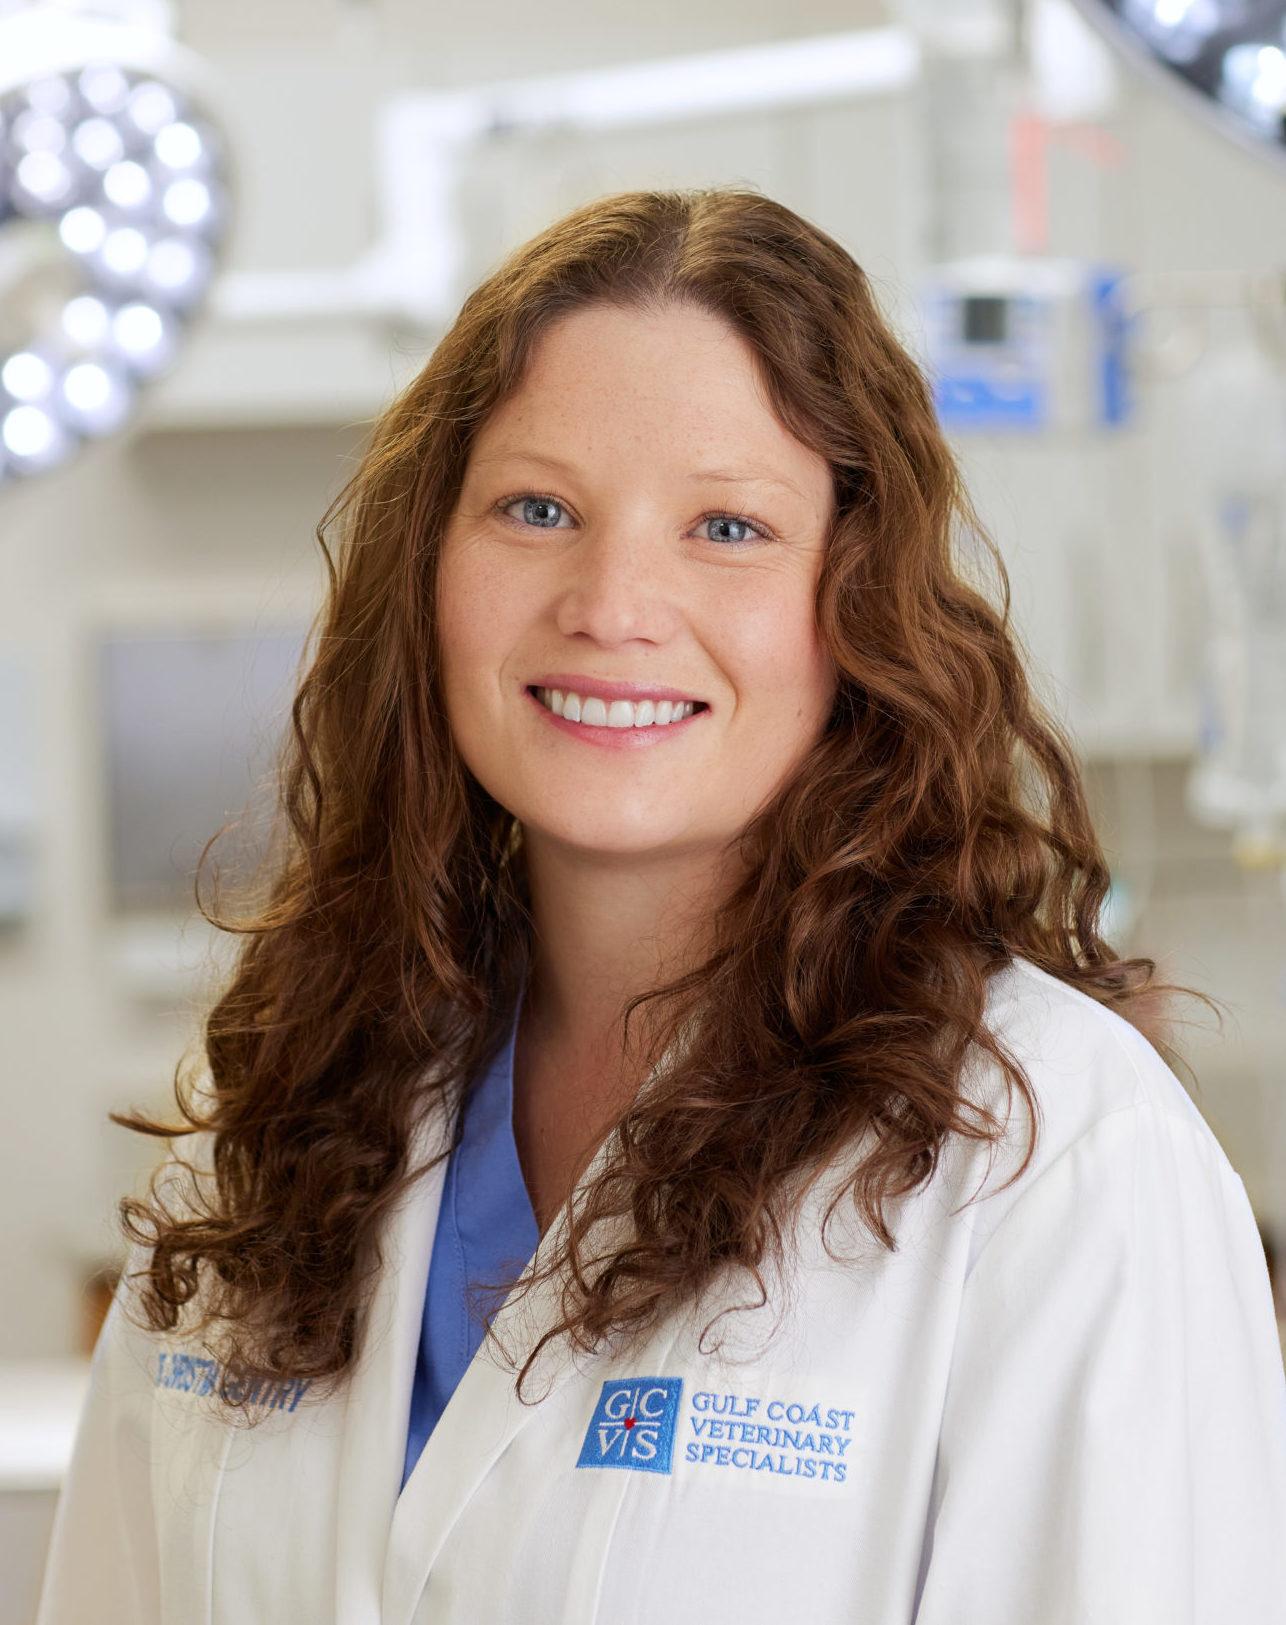 Christina Gentry, DVM, DACVD